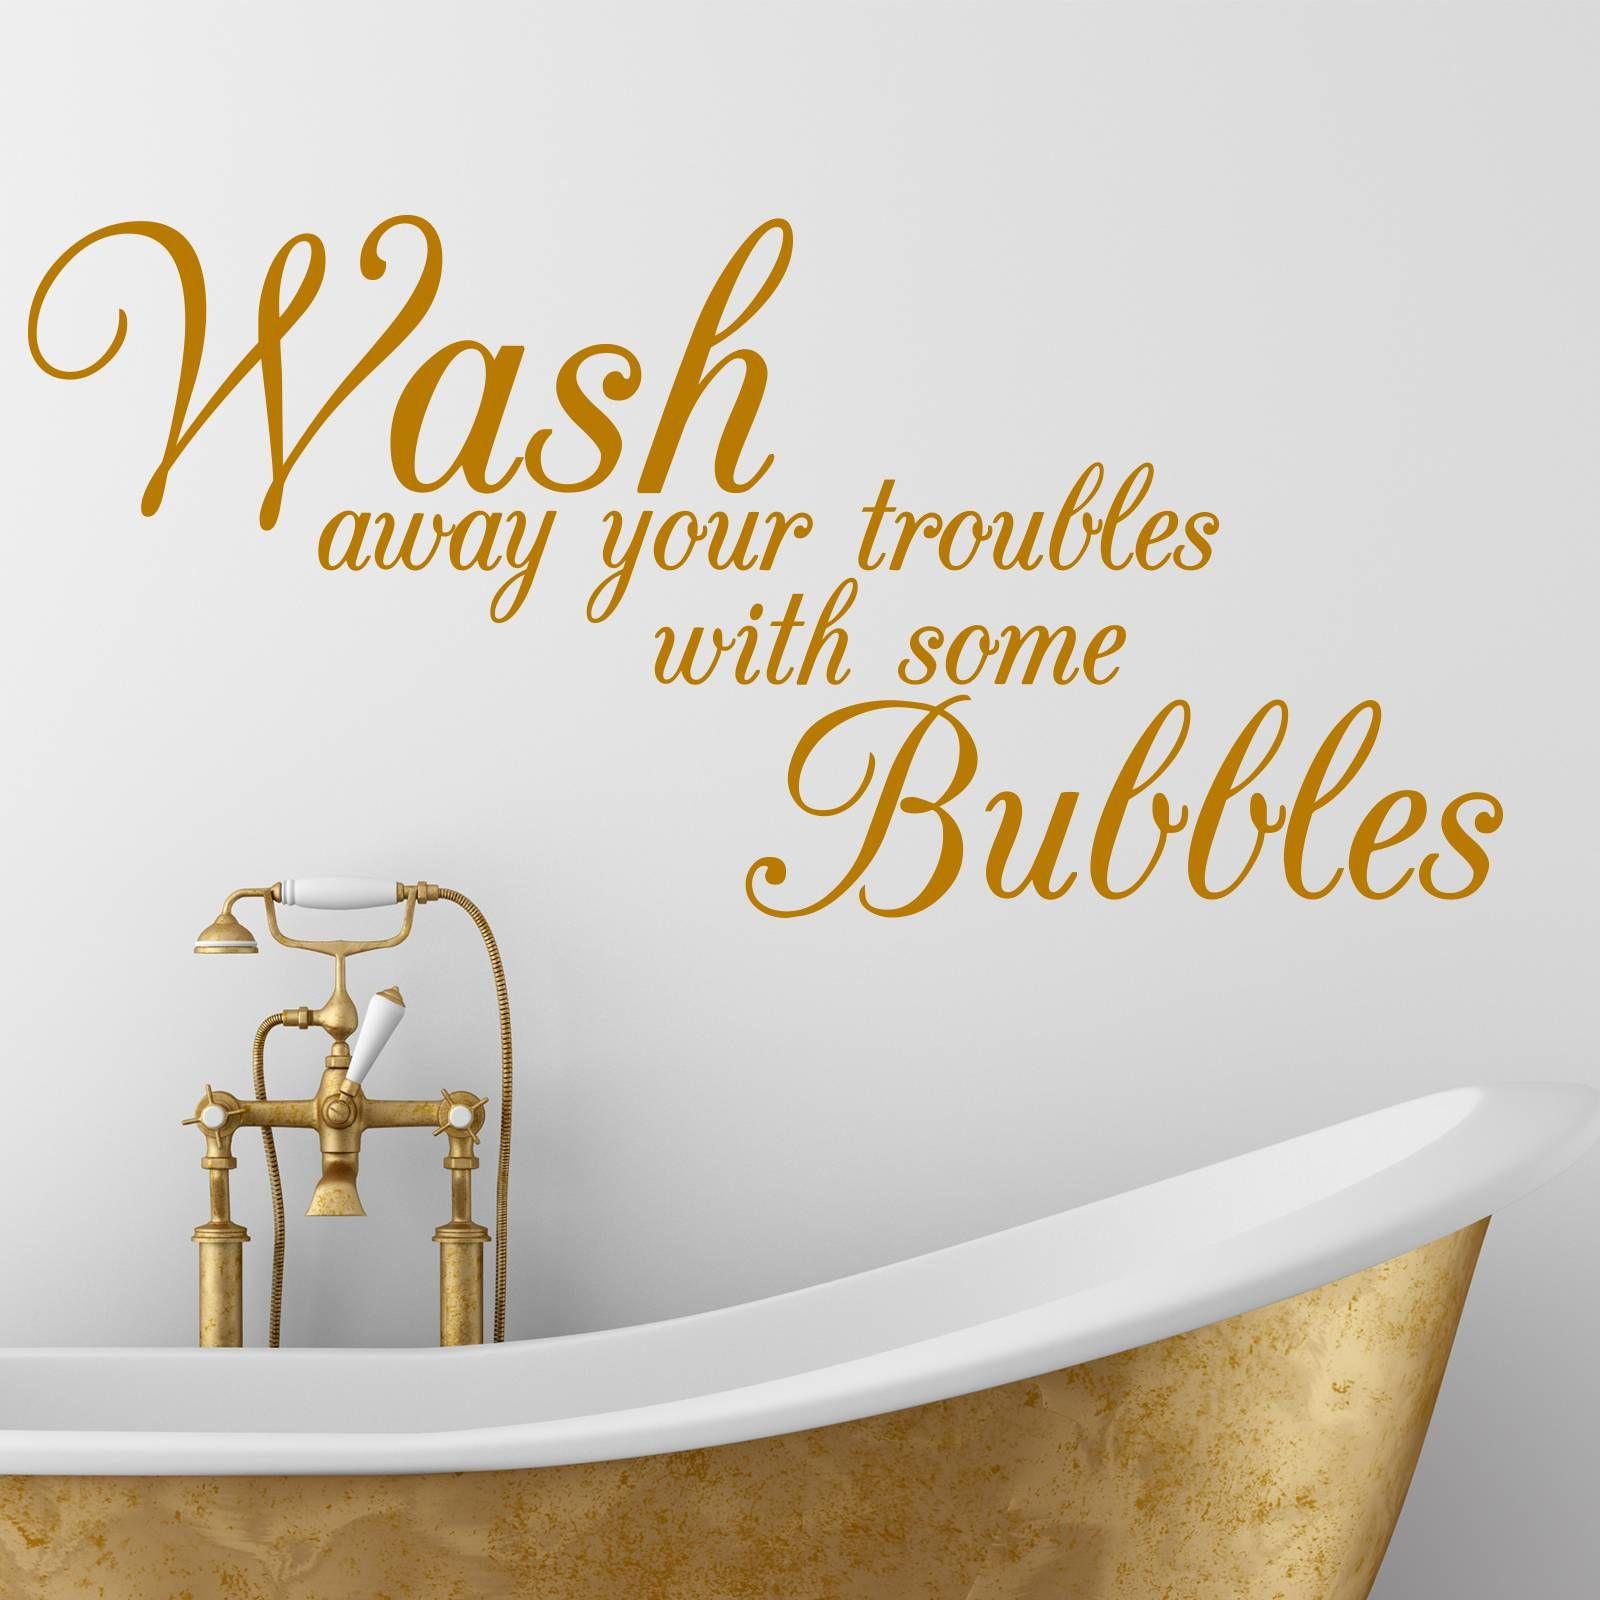 Bath Quotes Pinlollybomb On Quotes  Pinterest  Bath